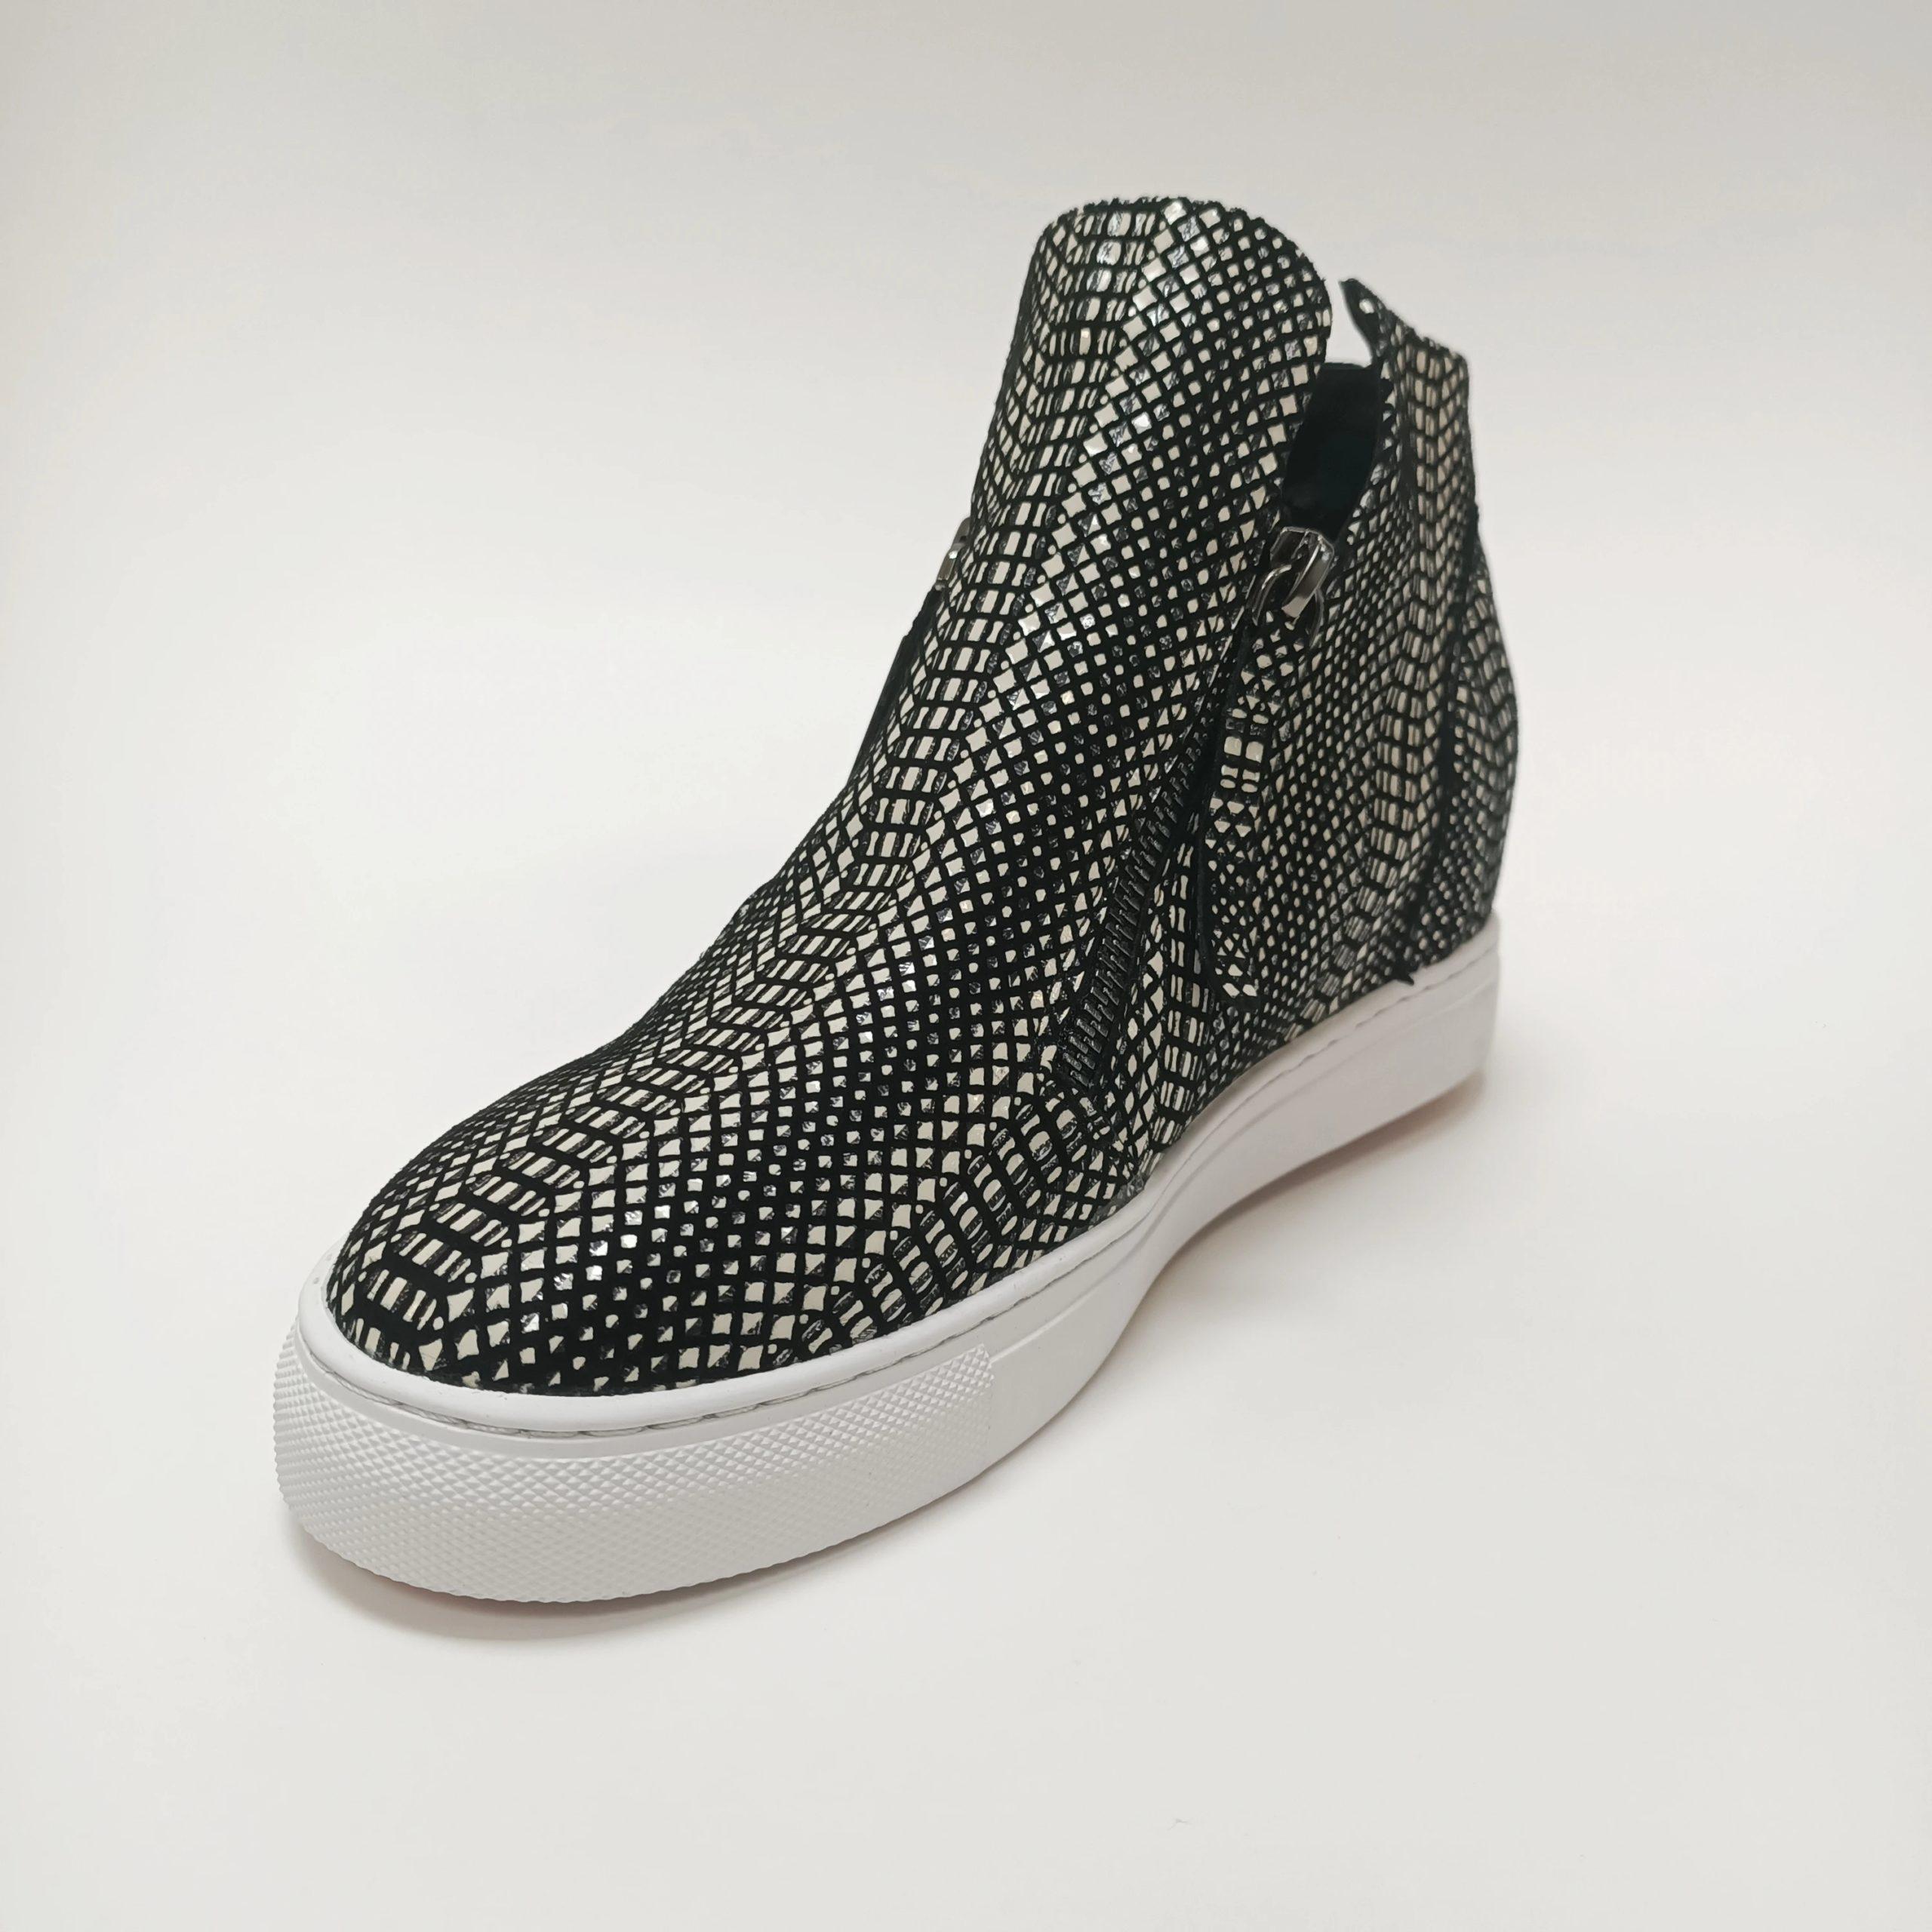 Willott Boot - Black Tire Tread - Minx